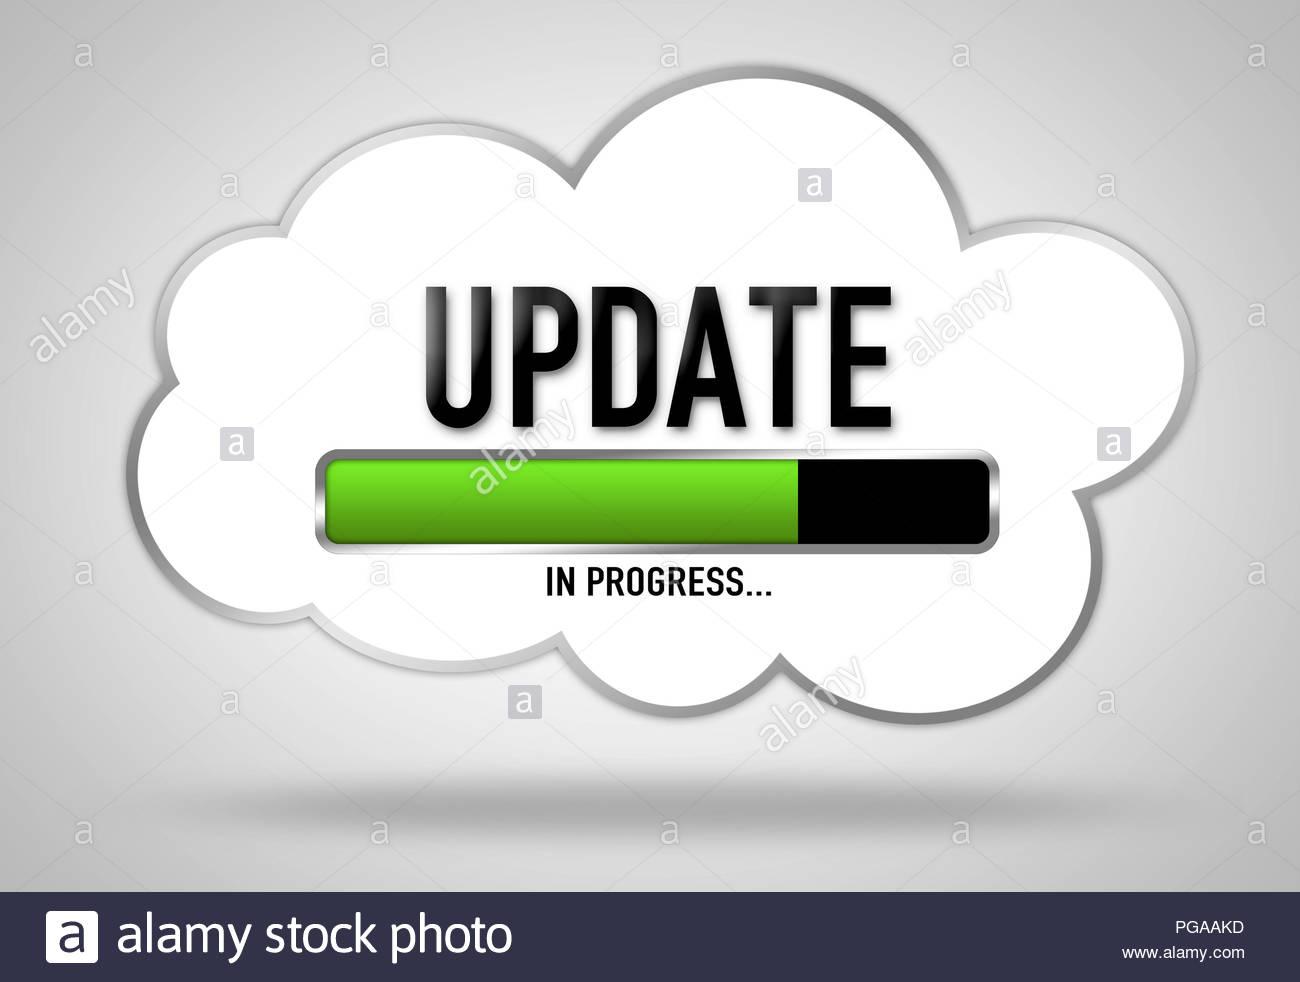 Update in progress - loading bar - Stock Image